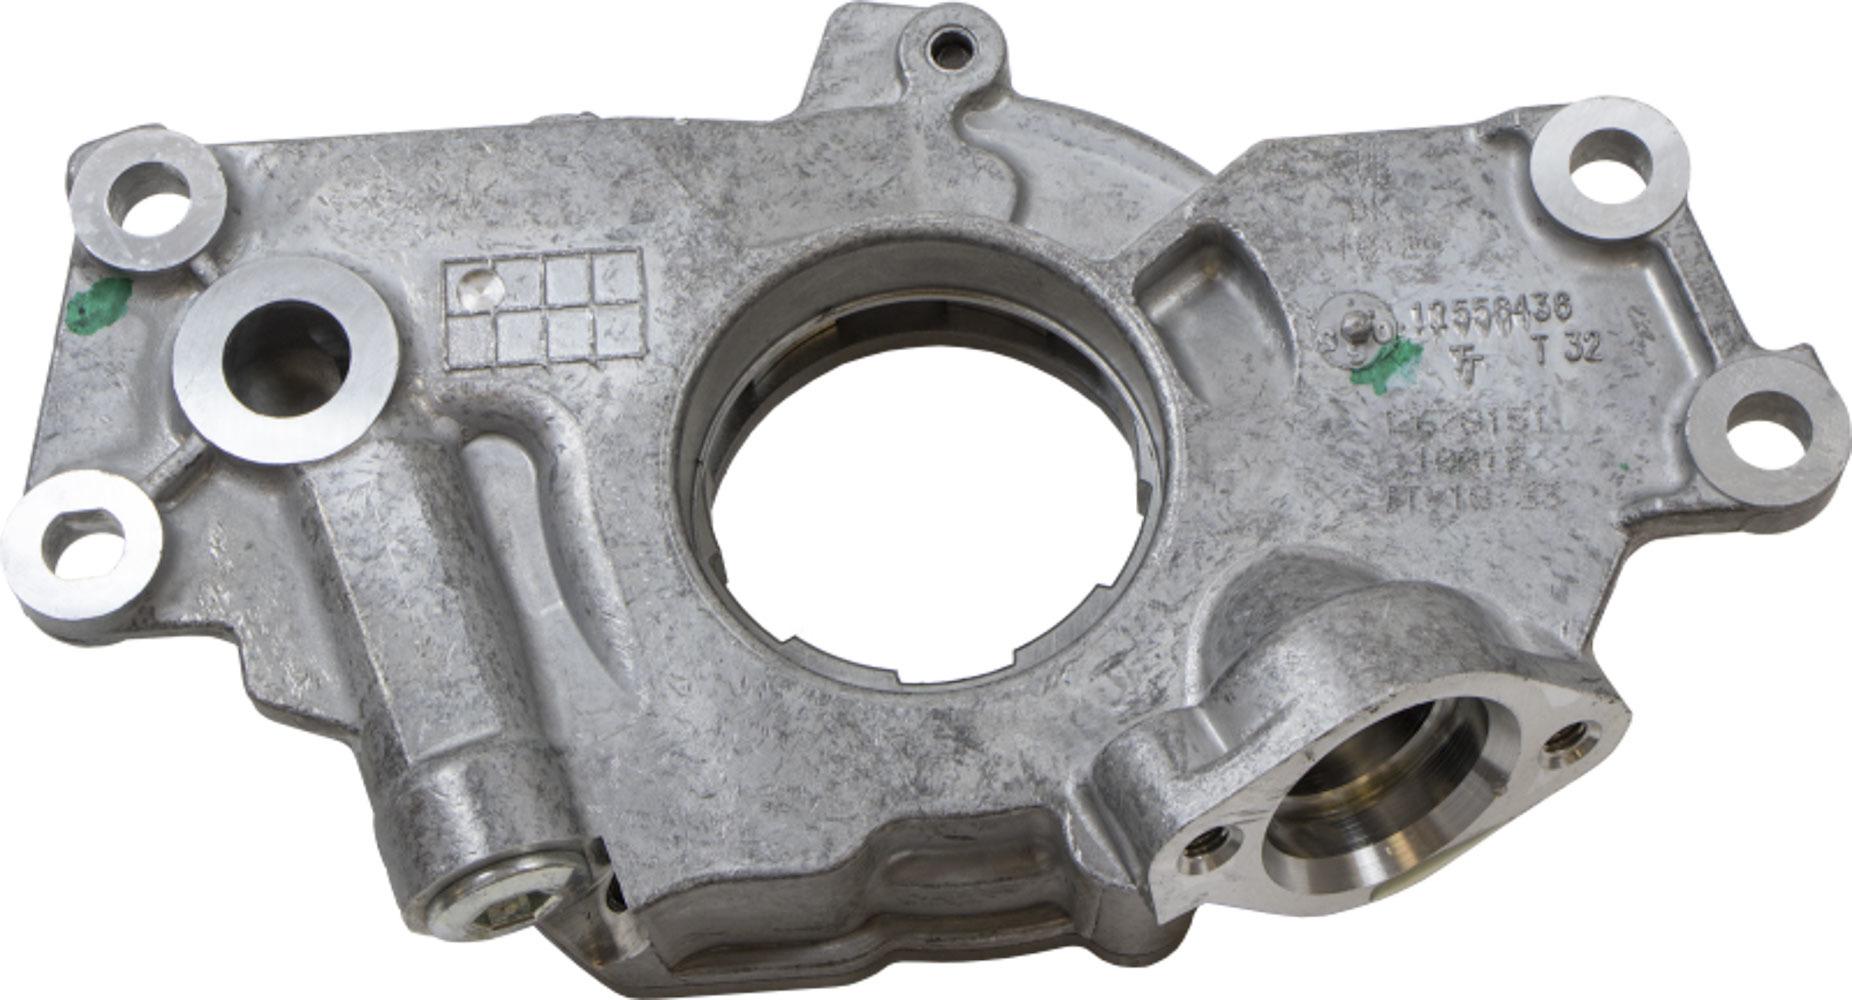 Chevrolet Performance 12710303 Oil Pump, Wet Sump, Internal, High Volume, GM LS-Series, Each